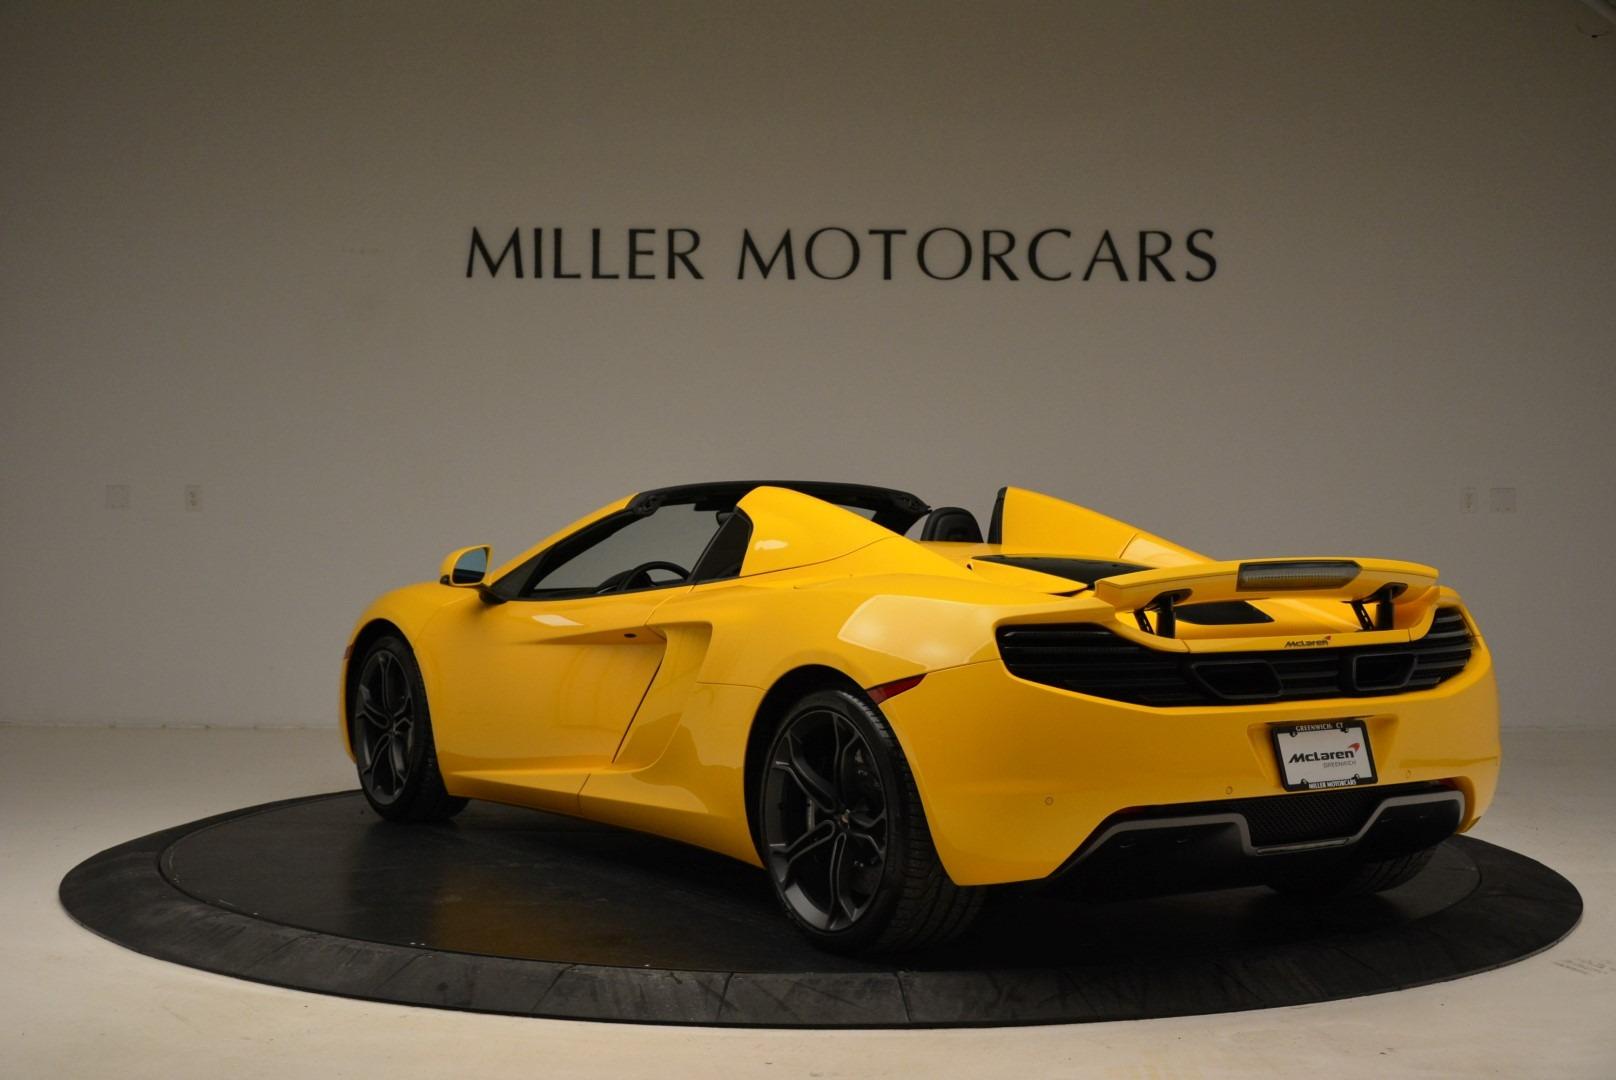 Used 2014 McLaren MP4-12C Spider For Sale In Greenwich, CT. Alfa Romeo of Greenwich, 3134 2057_p5